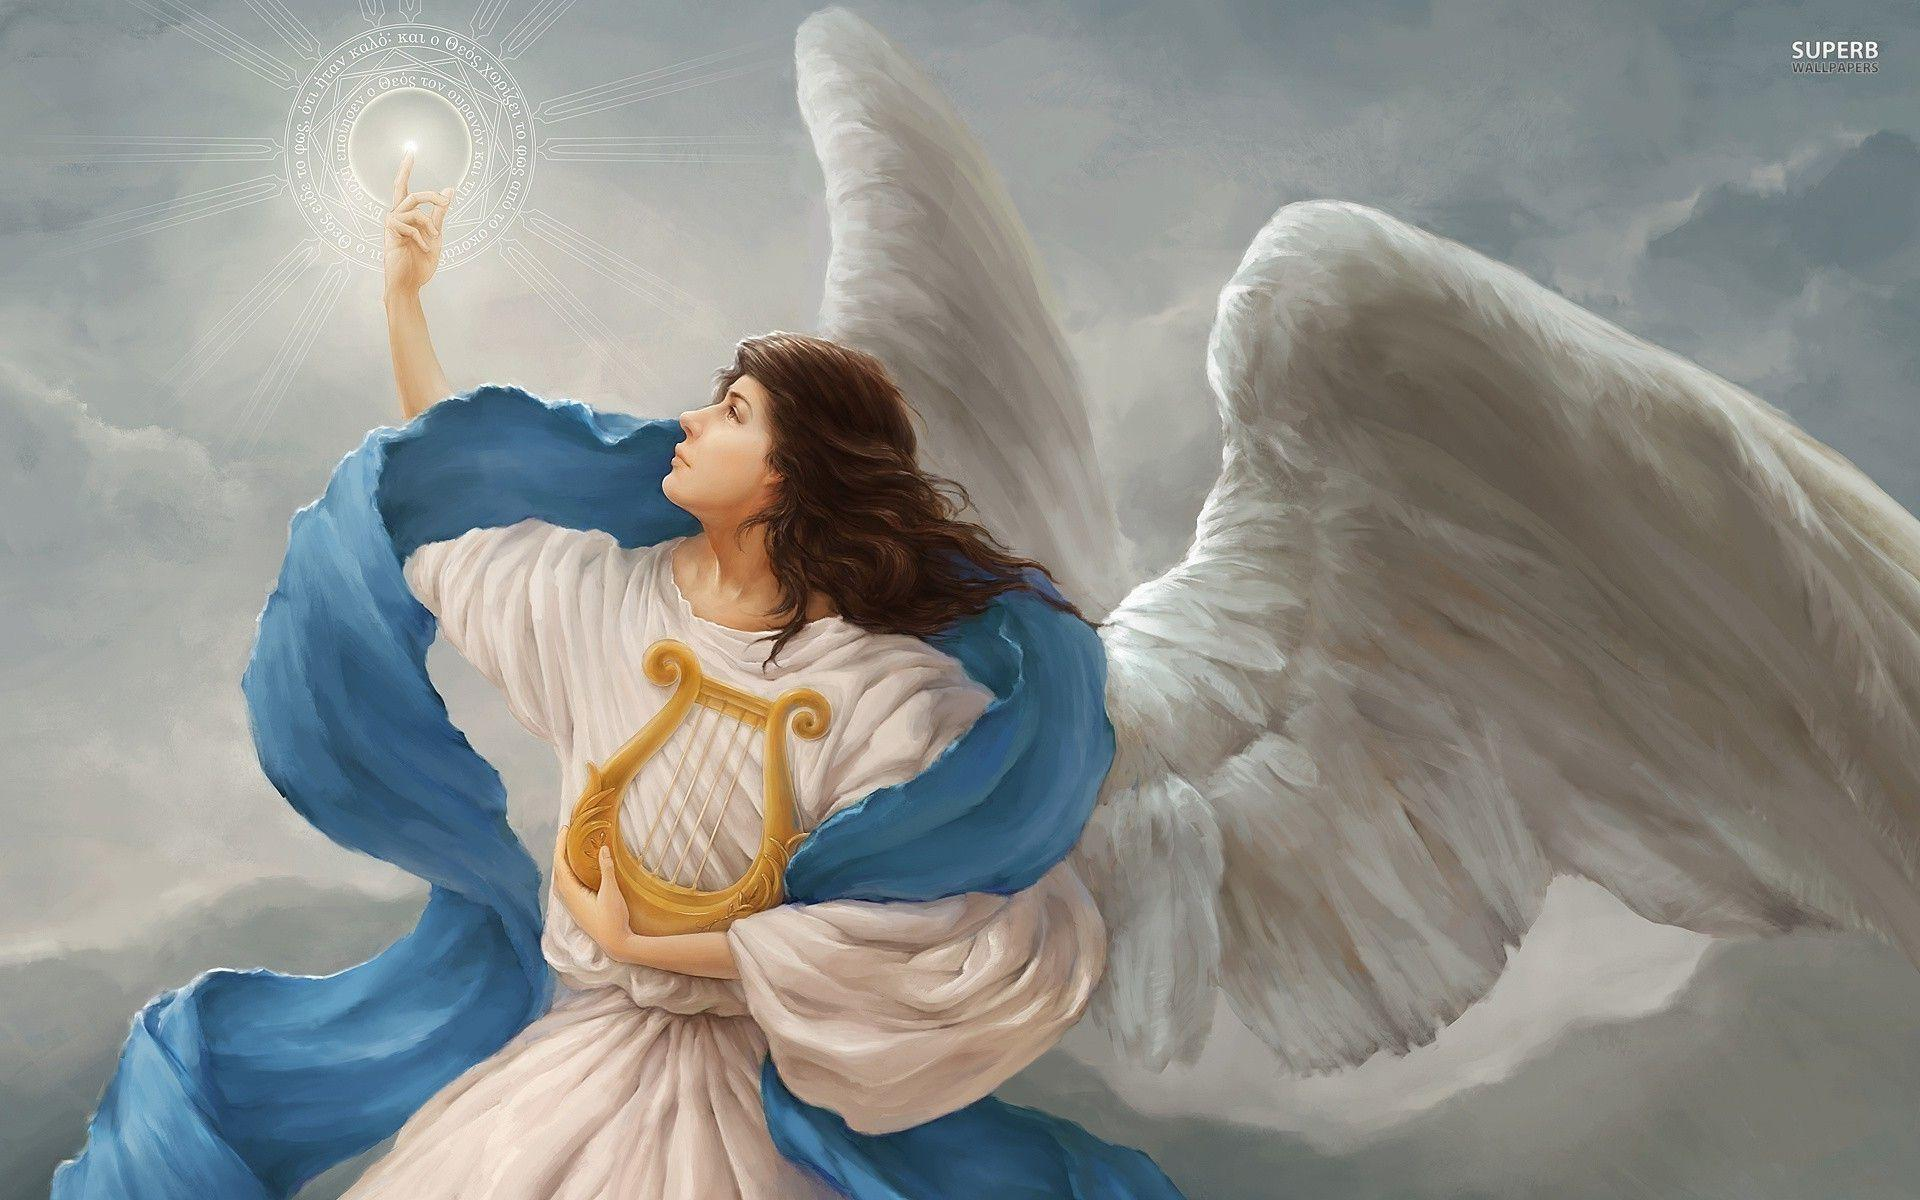 archangel michael wallpaper for computer - photo #14